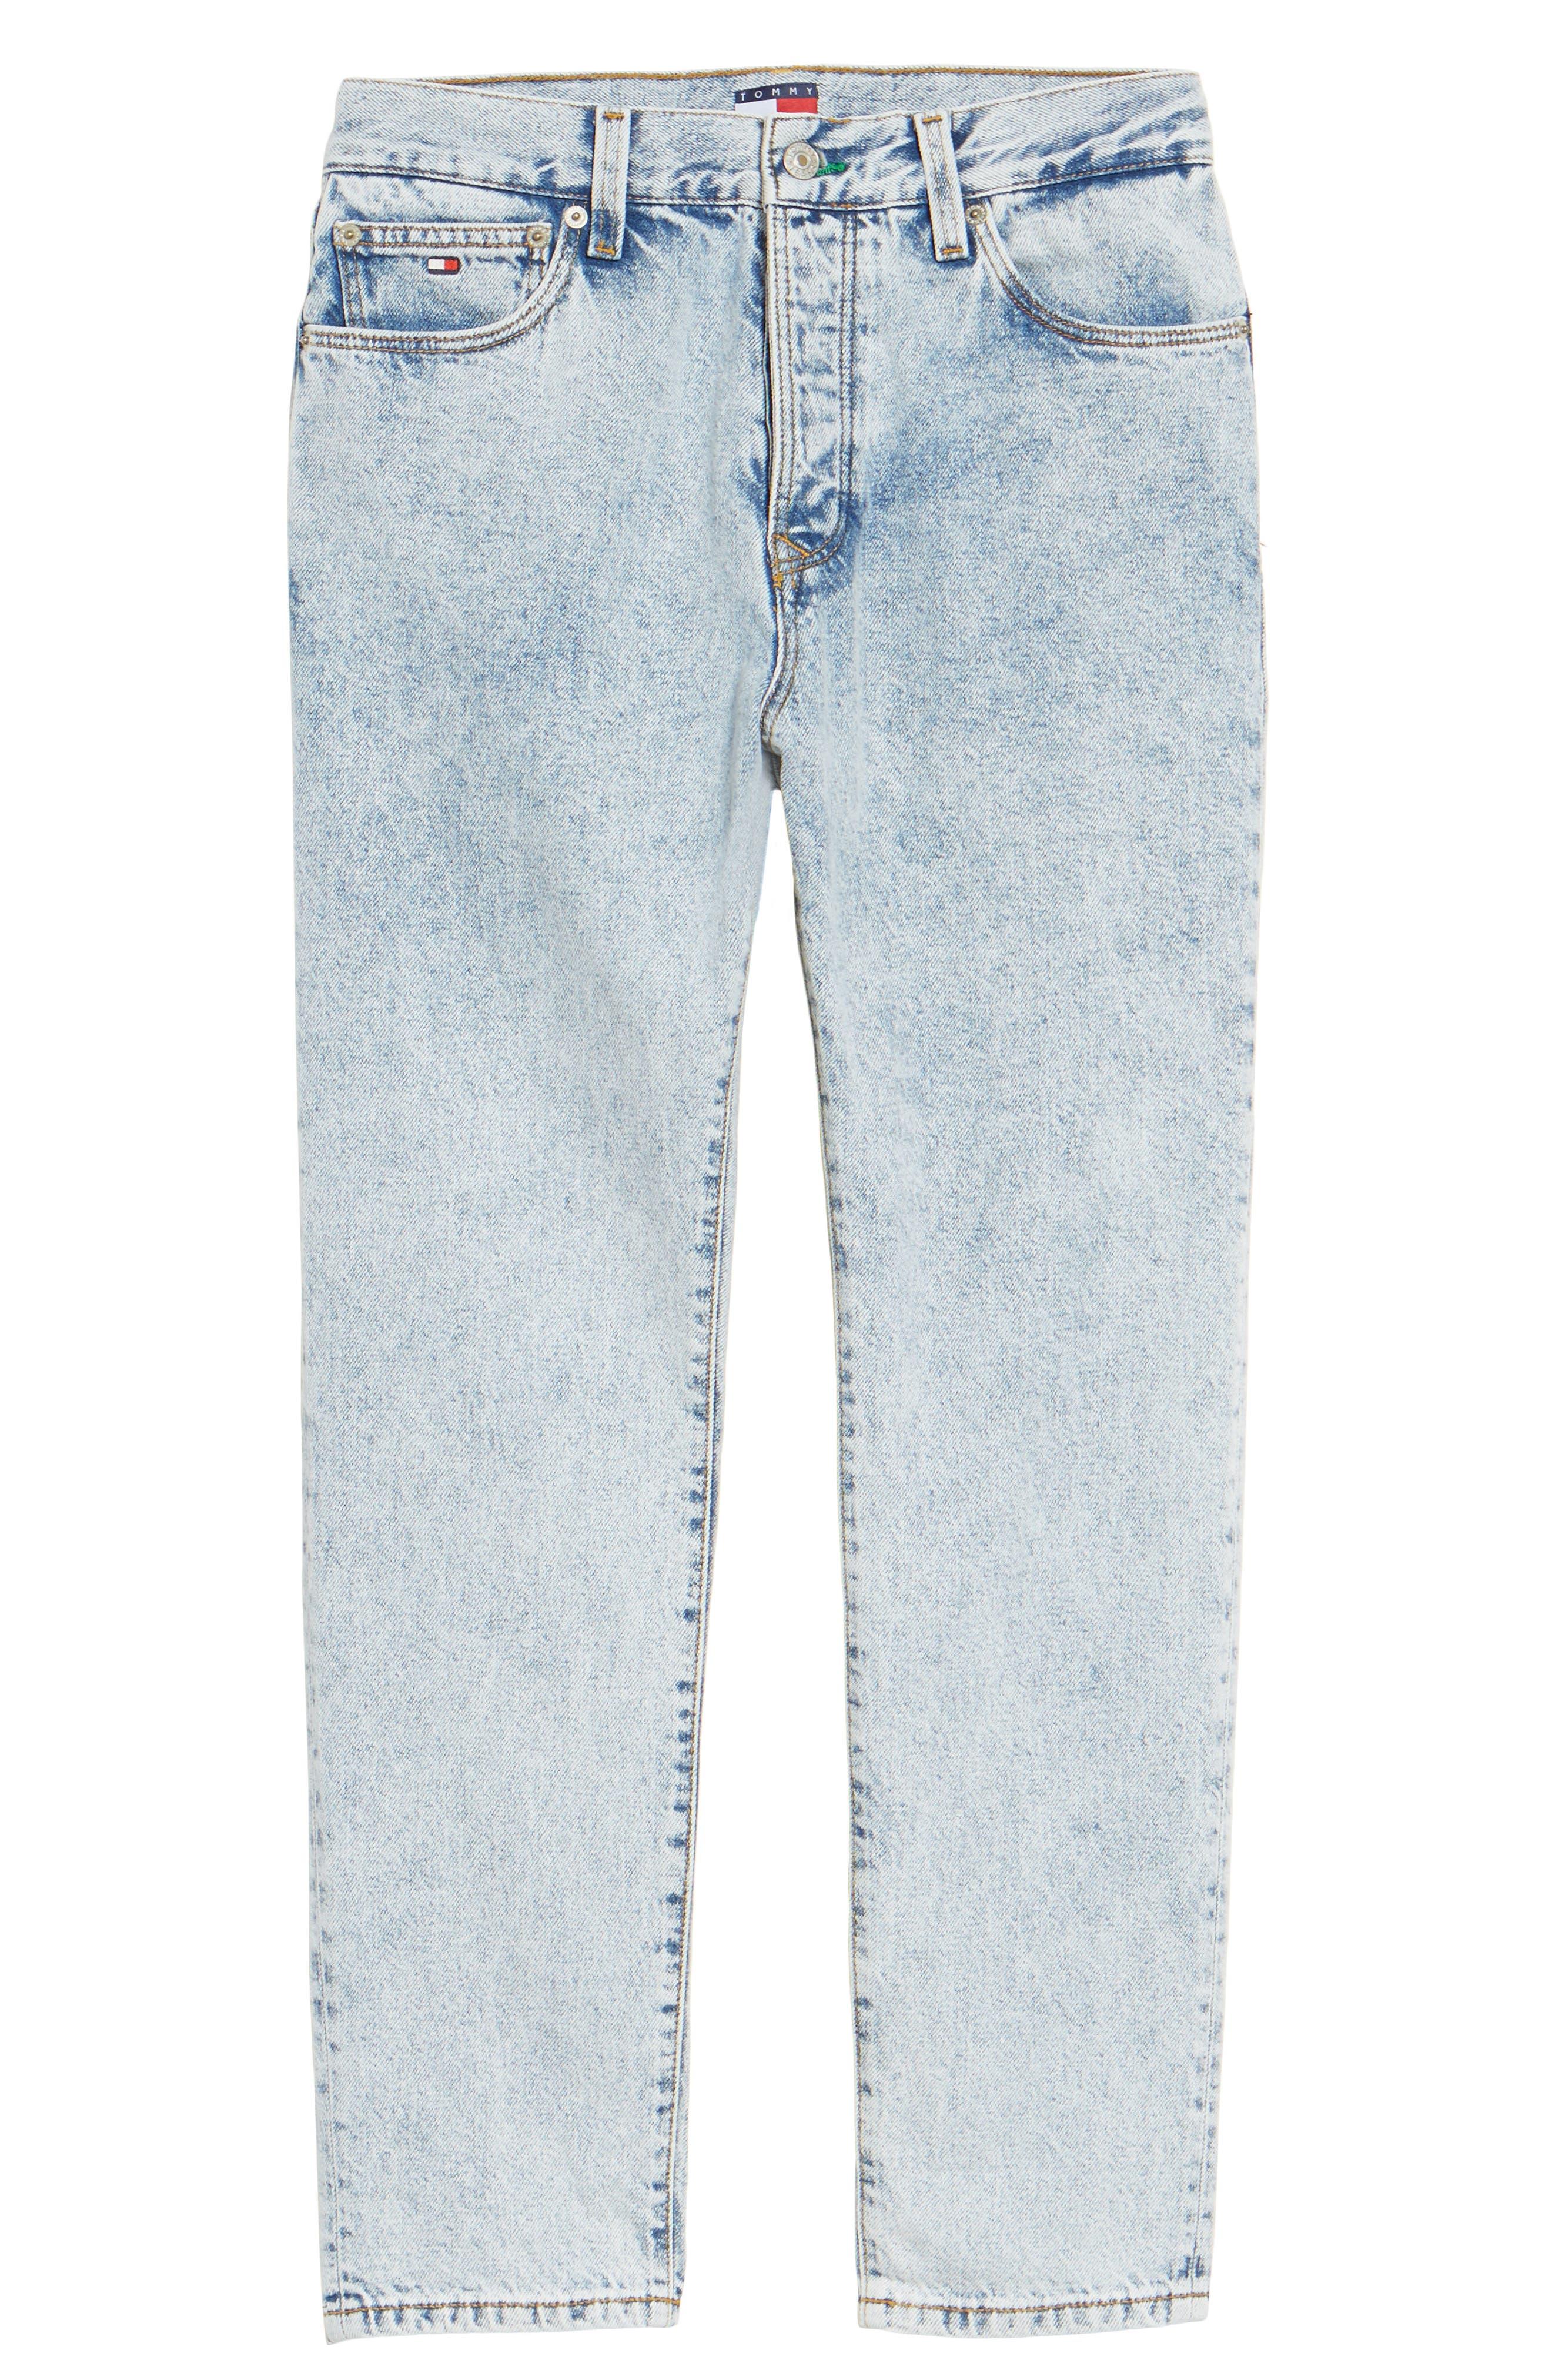 90s Classic Straight Leg Jeans,                             Alternate thumbnail 23, color,